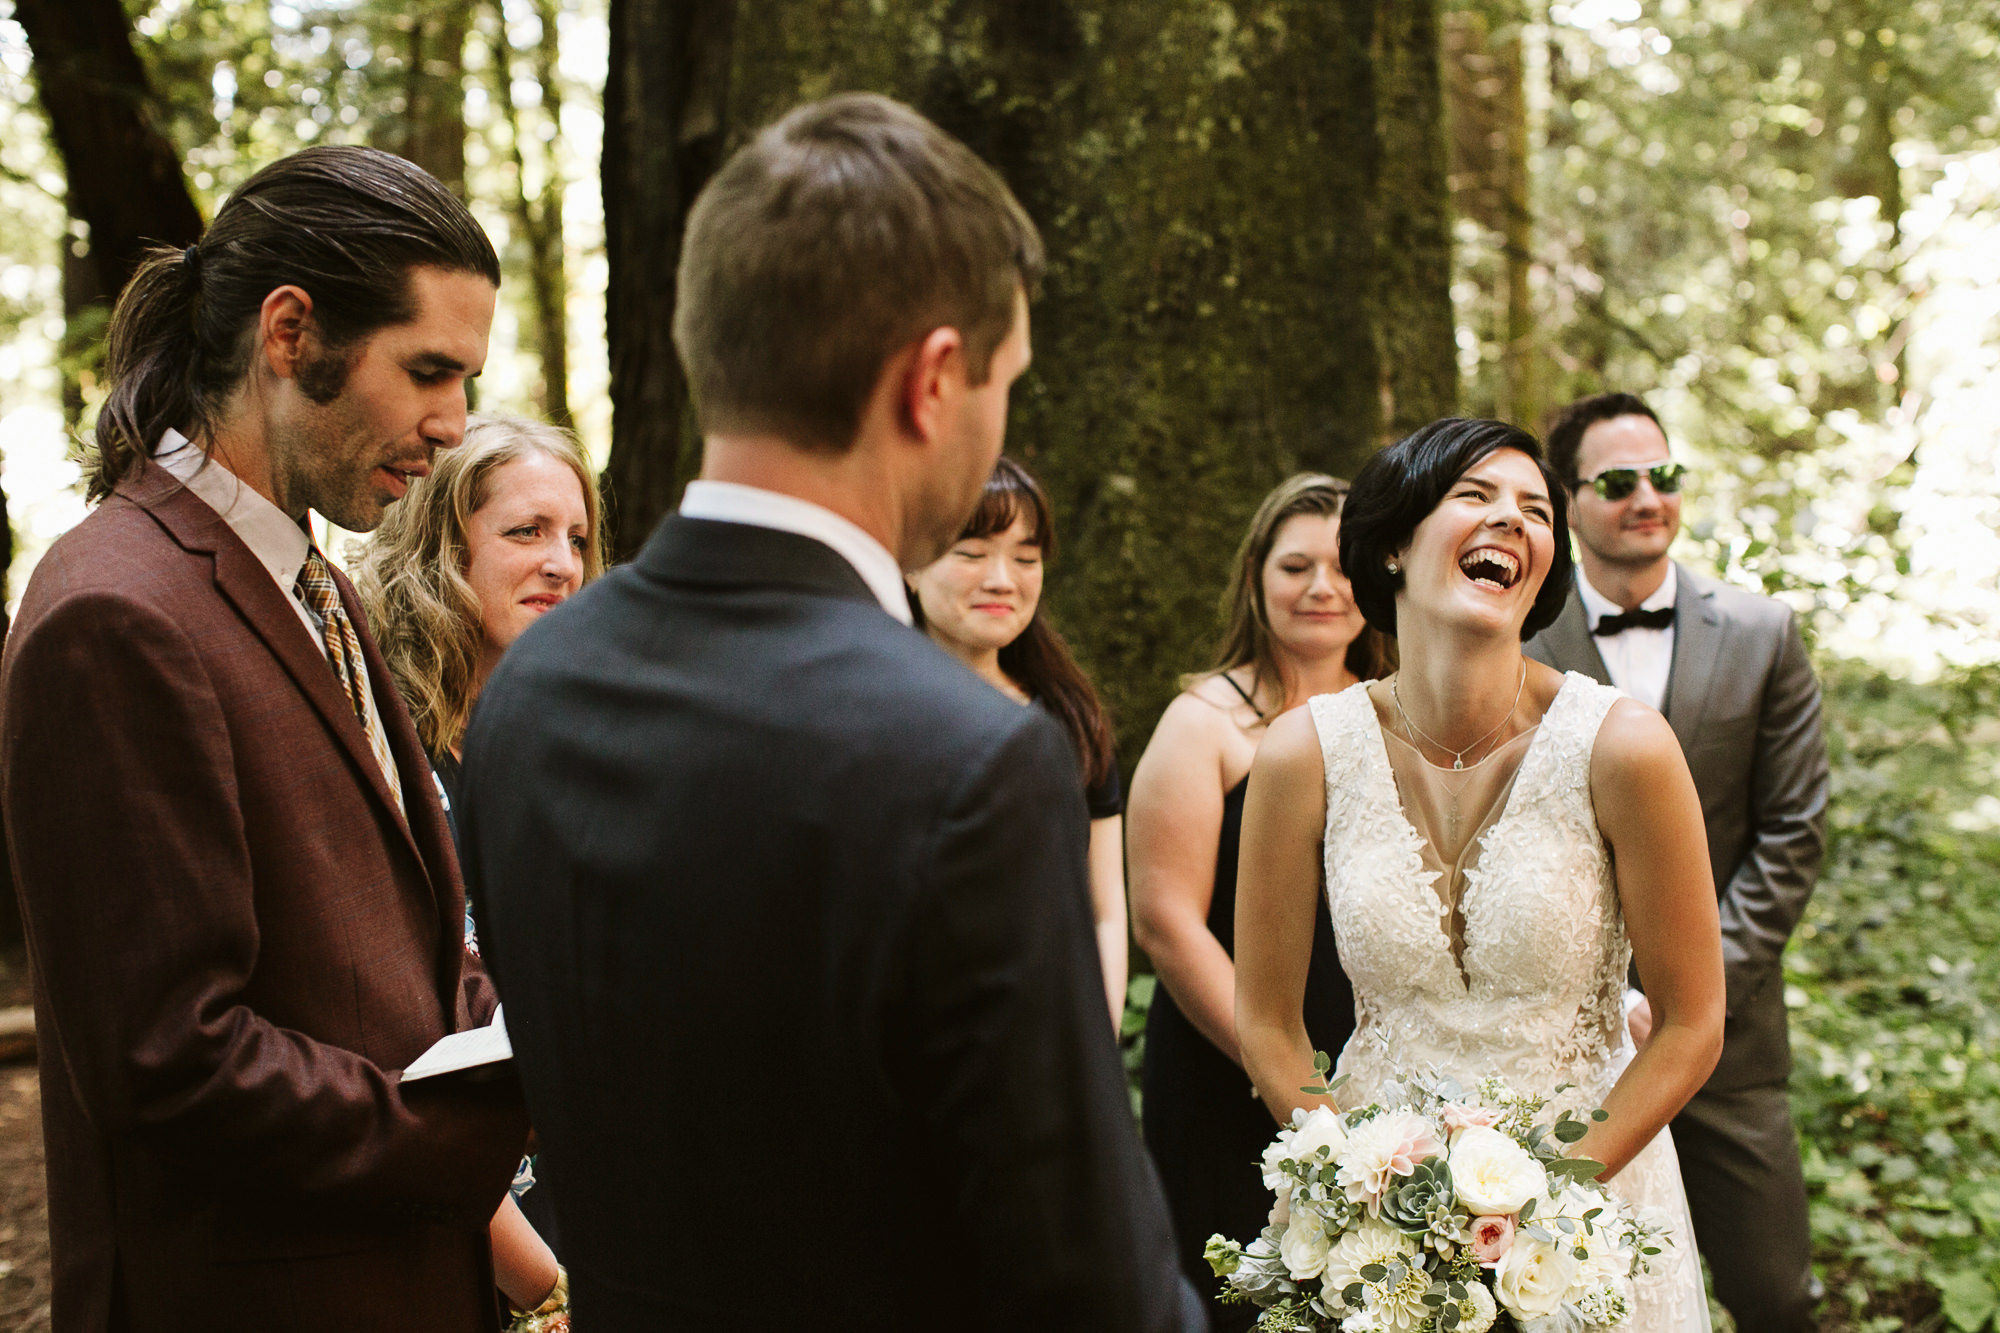 California-wedding-photographer-alfonso-flores-pamplin-groove-182.jpg